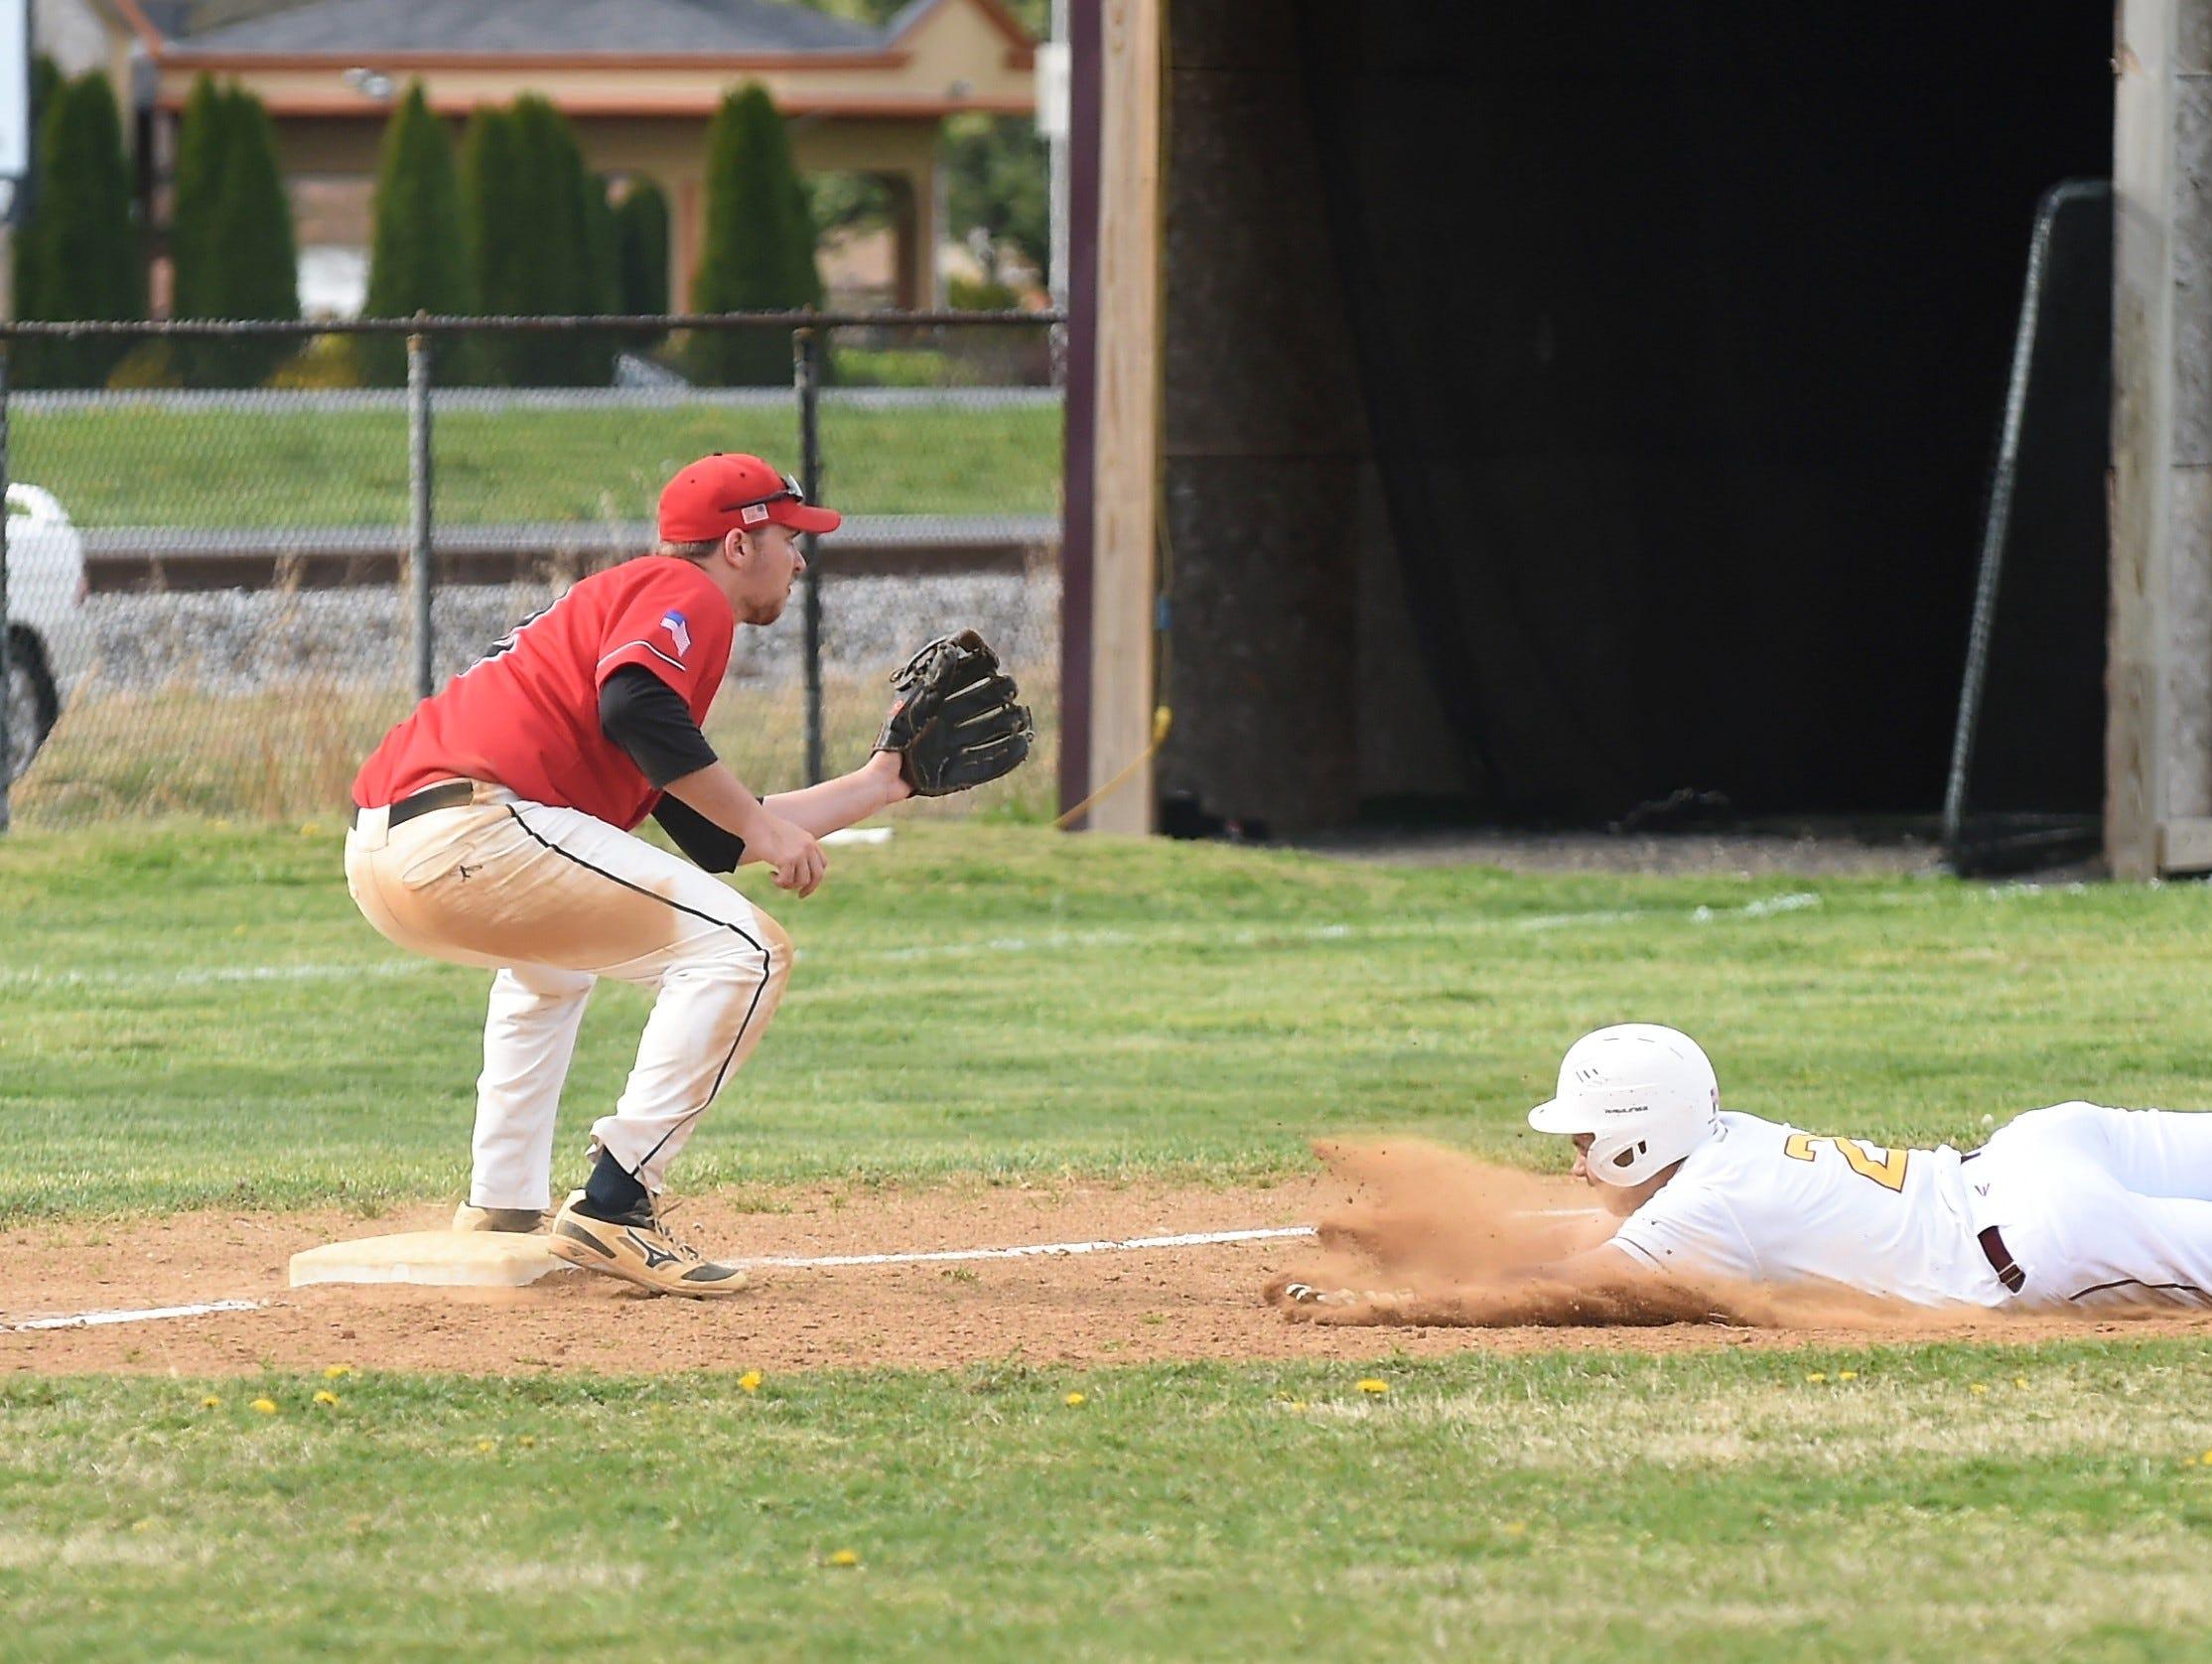 James M. Bennett third baseman Brett Swift looks for the throw as a Washington player slides into third on Thursday, April 11, 2019. JMB won, 13-2.